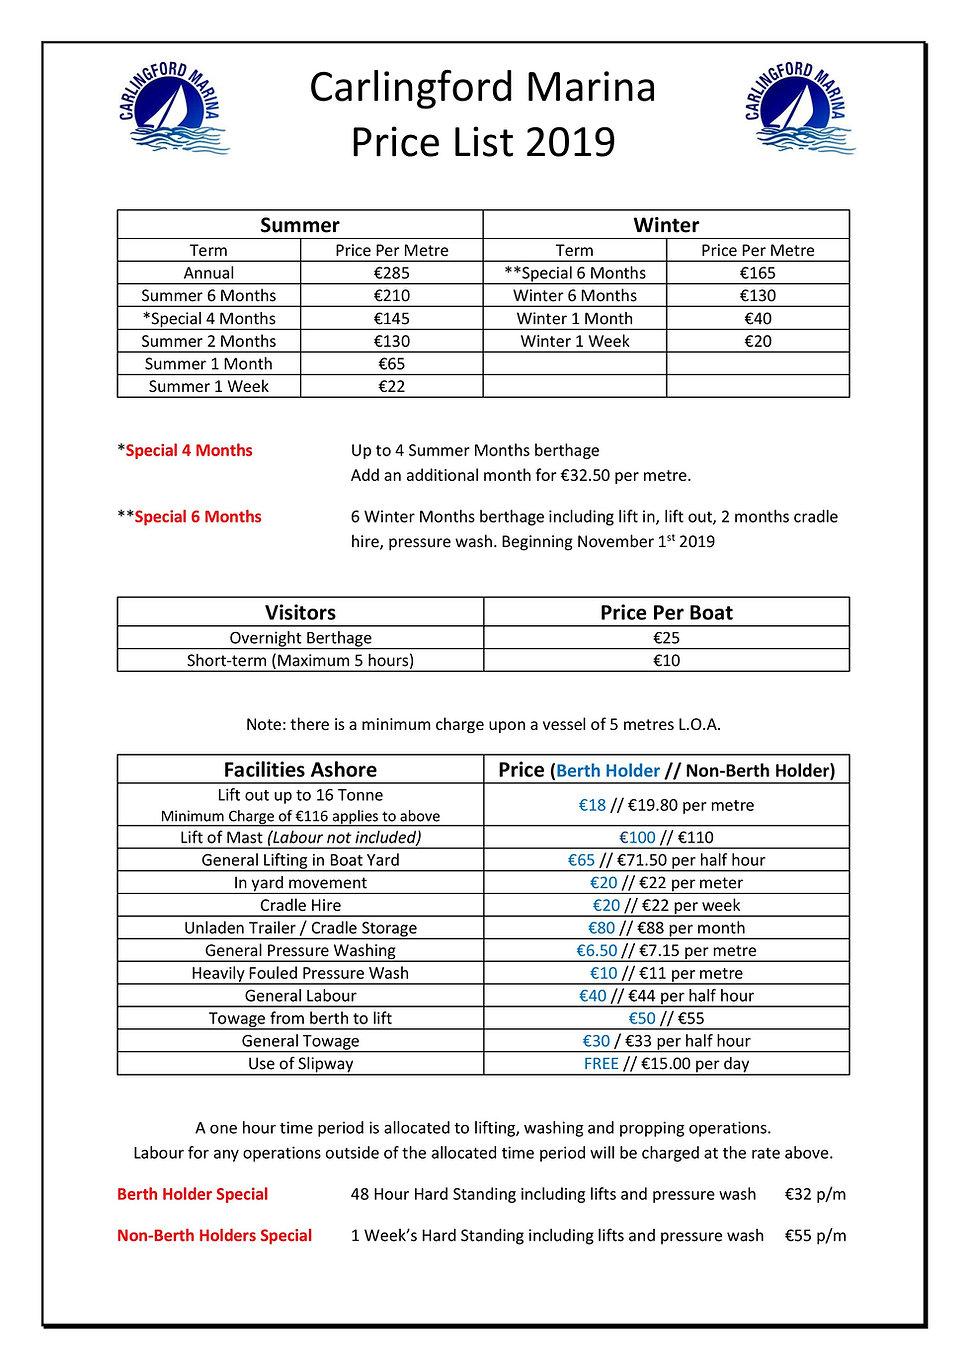 Price List 2019-page-001.jpg